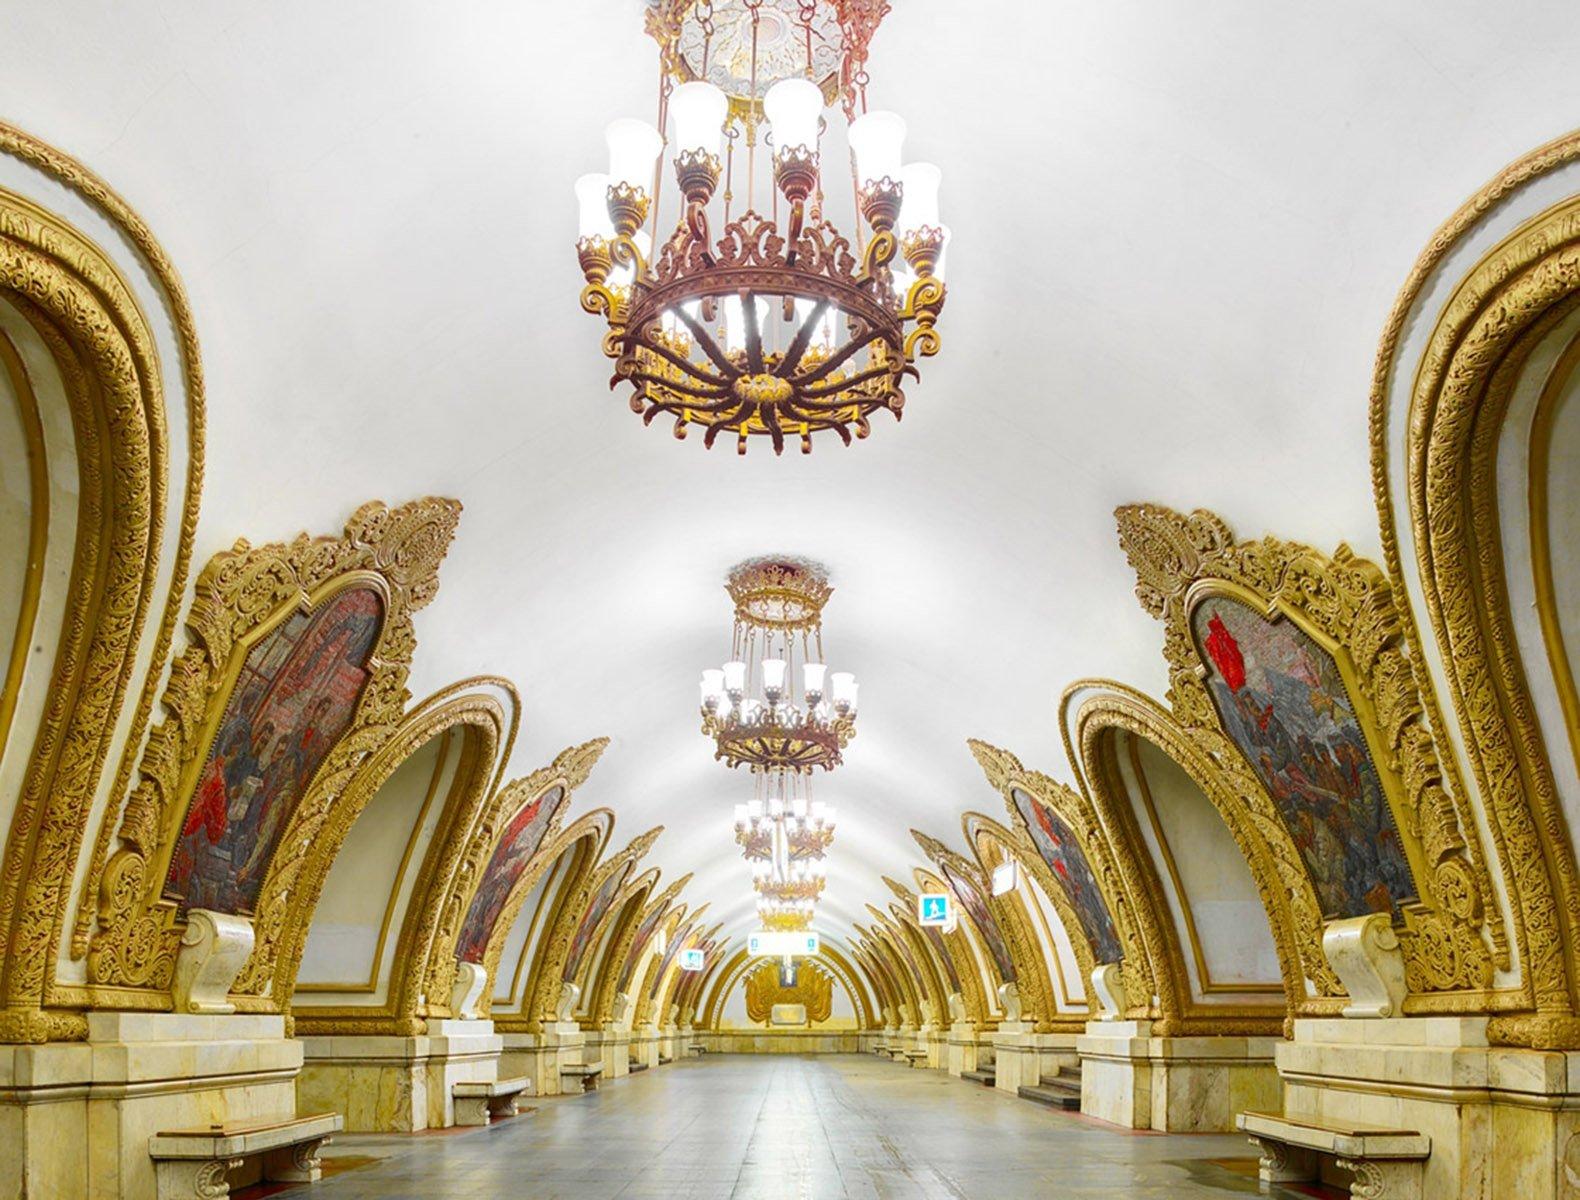 Kiyevsskaya-Metro-Stationeast-Moscow-Russia